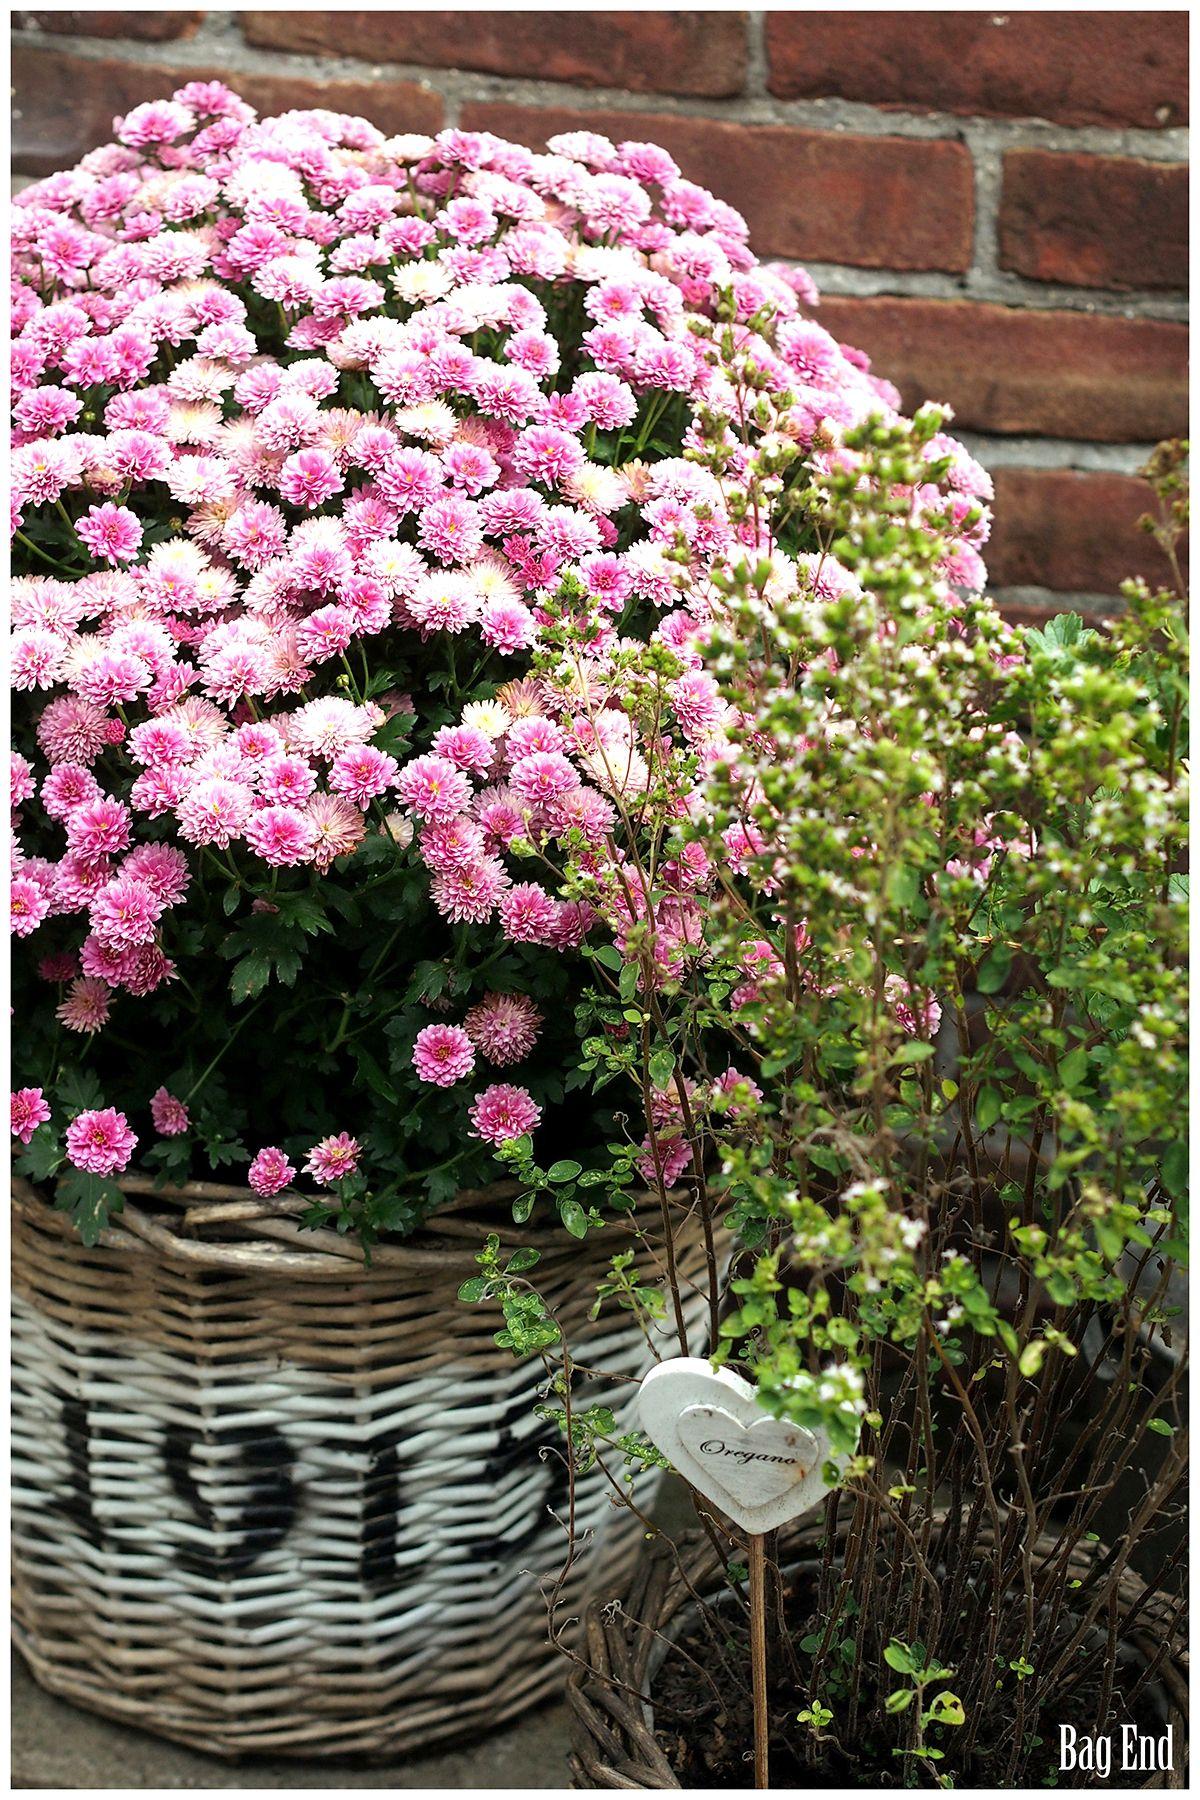 Pink chrysanthemum pinkki krysanteemi container gardening